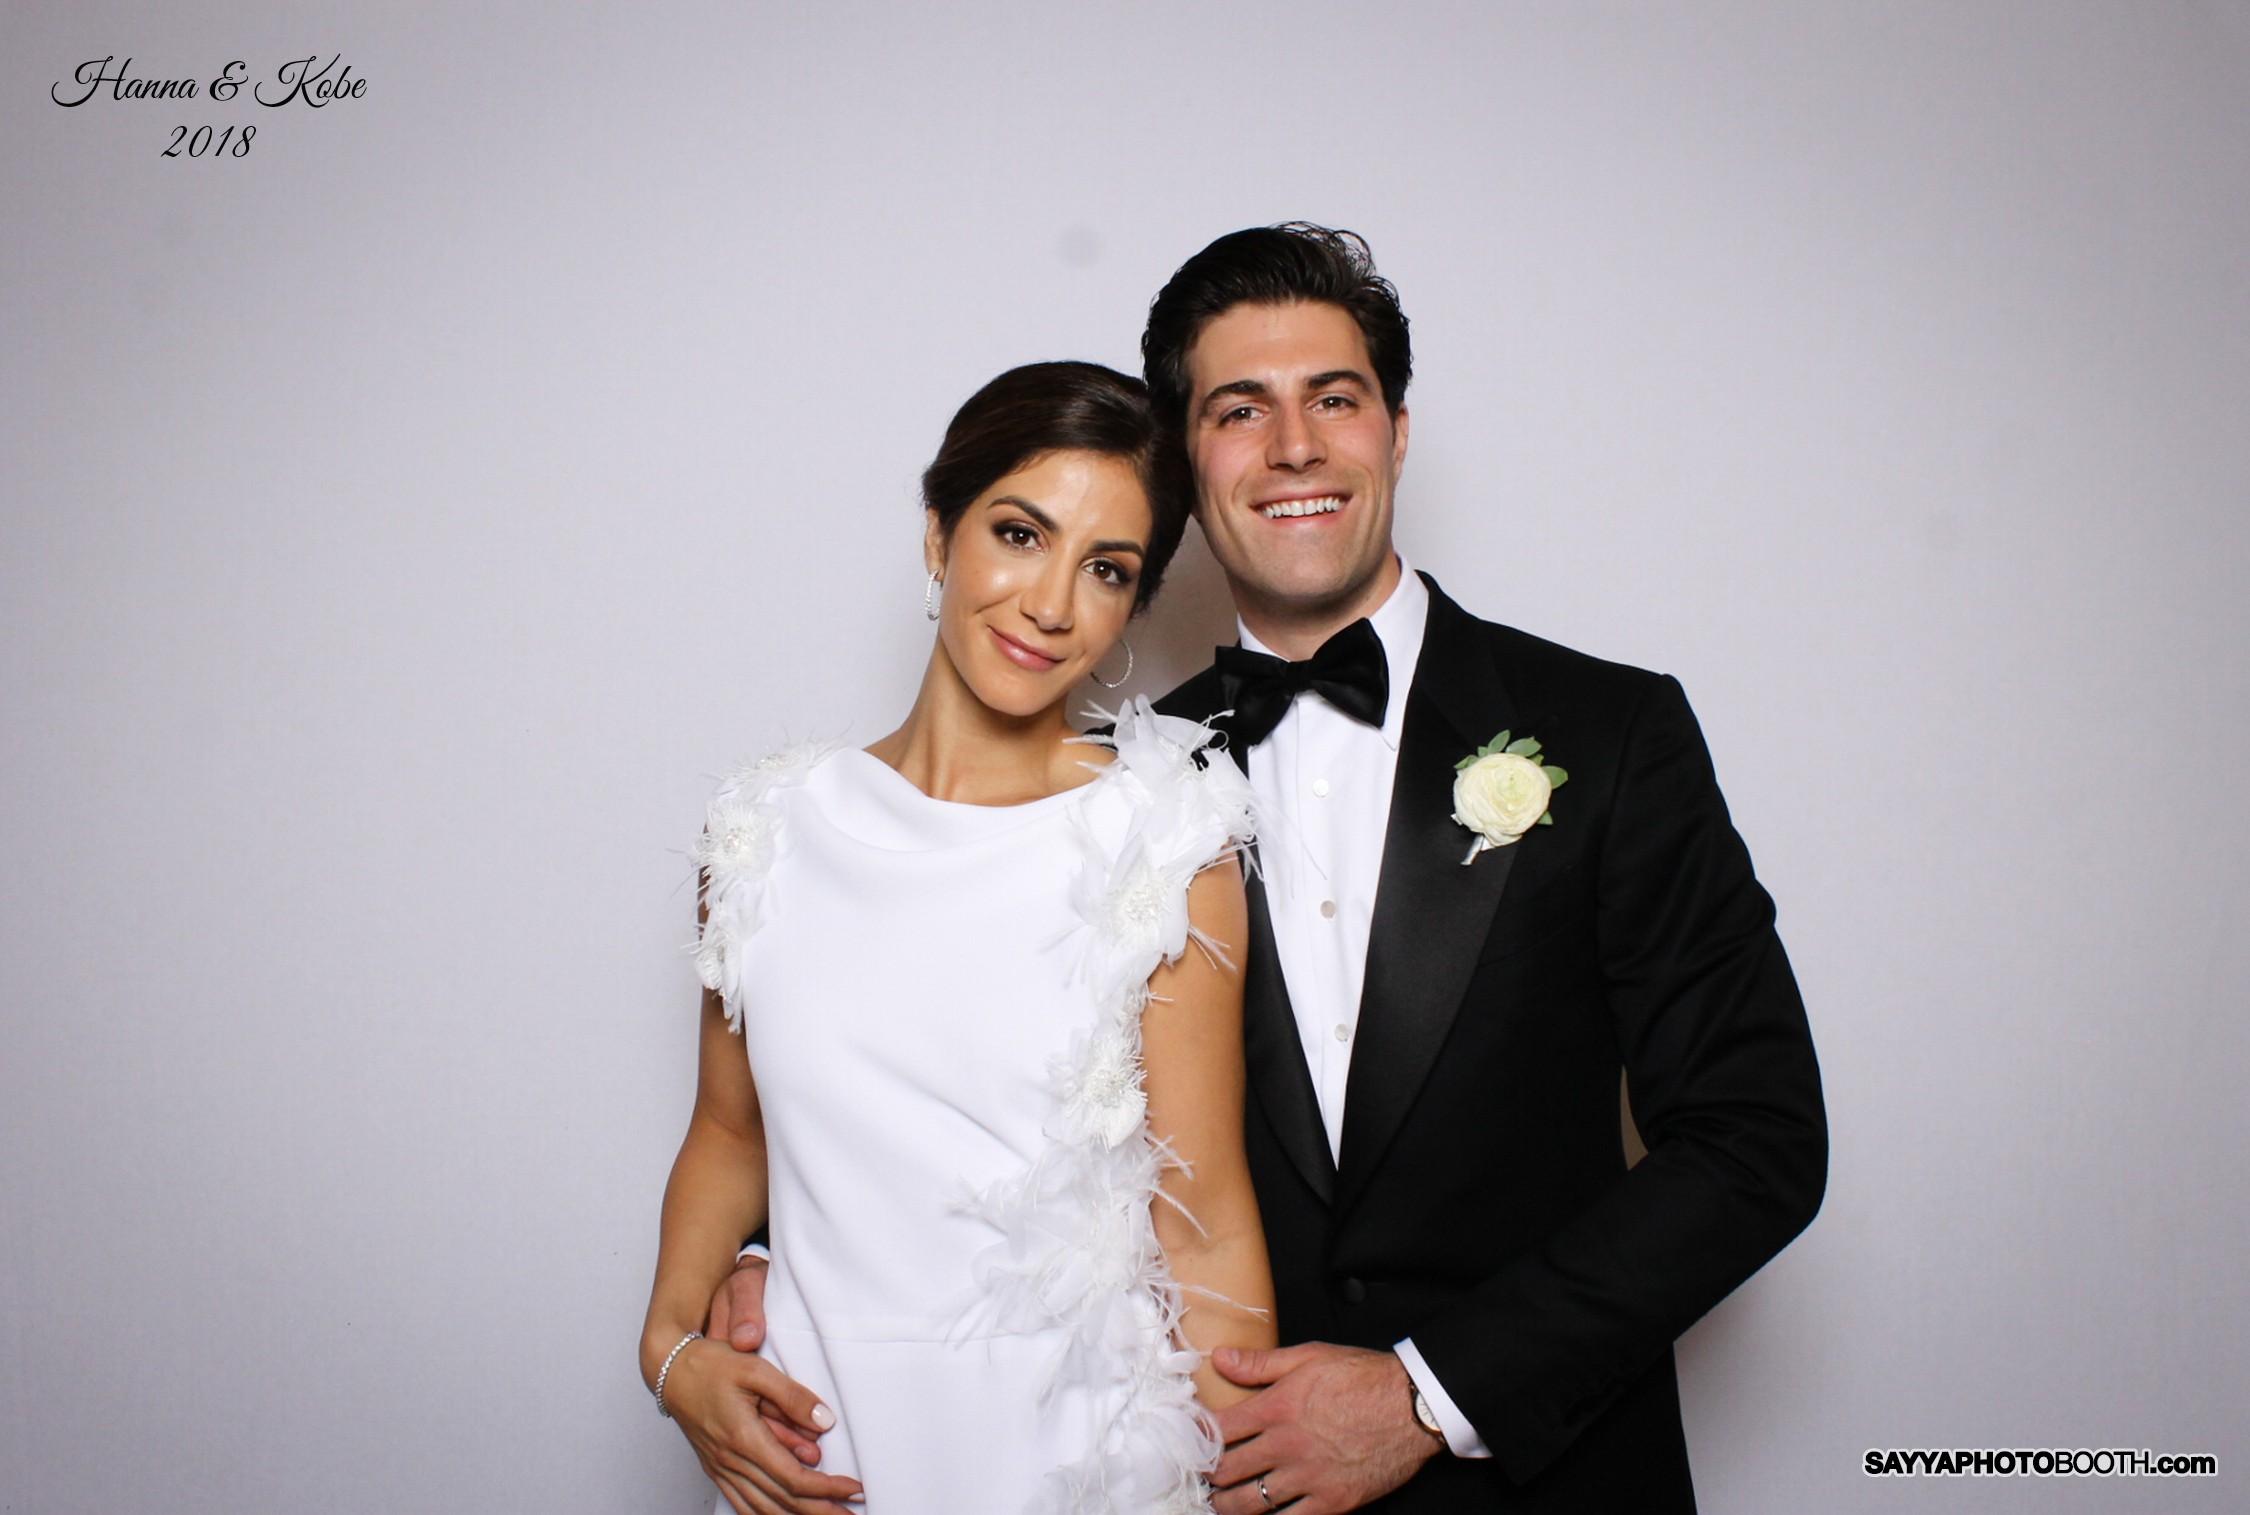 Hanna and Kobe's Wedding